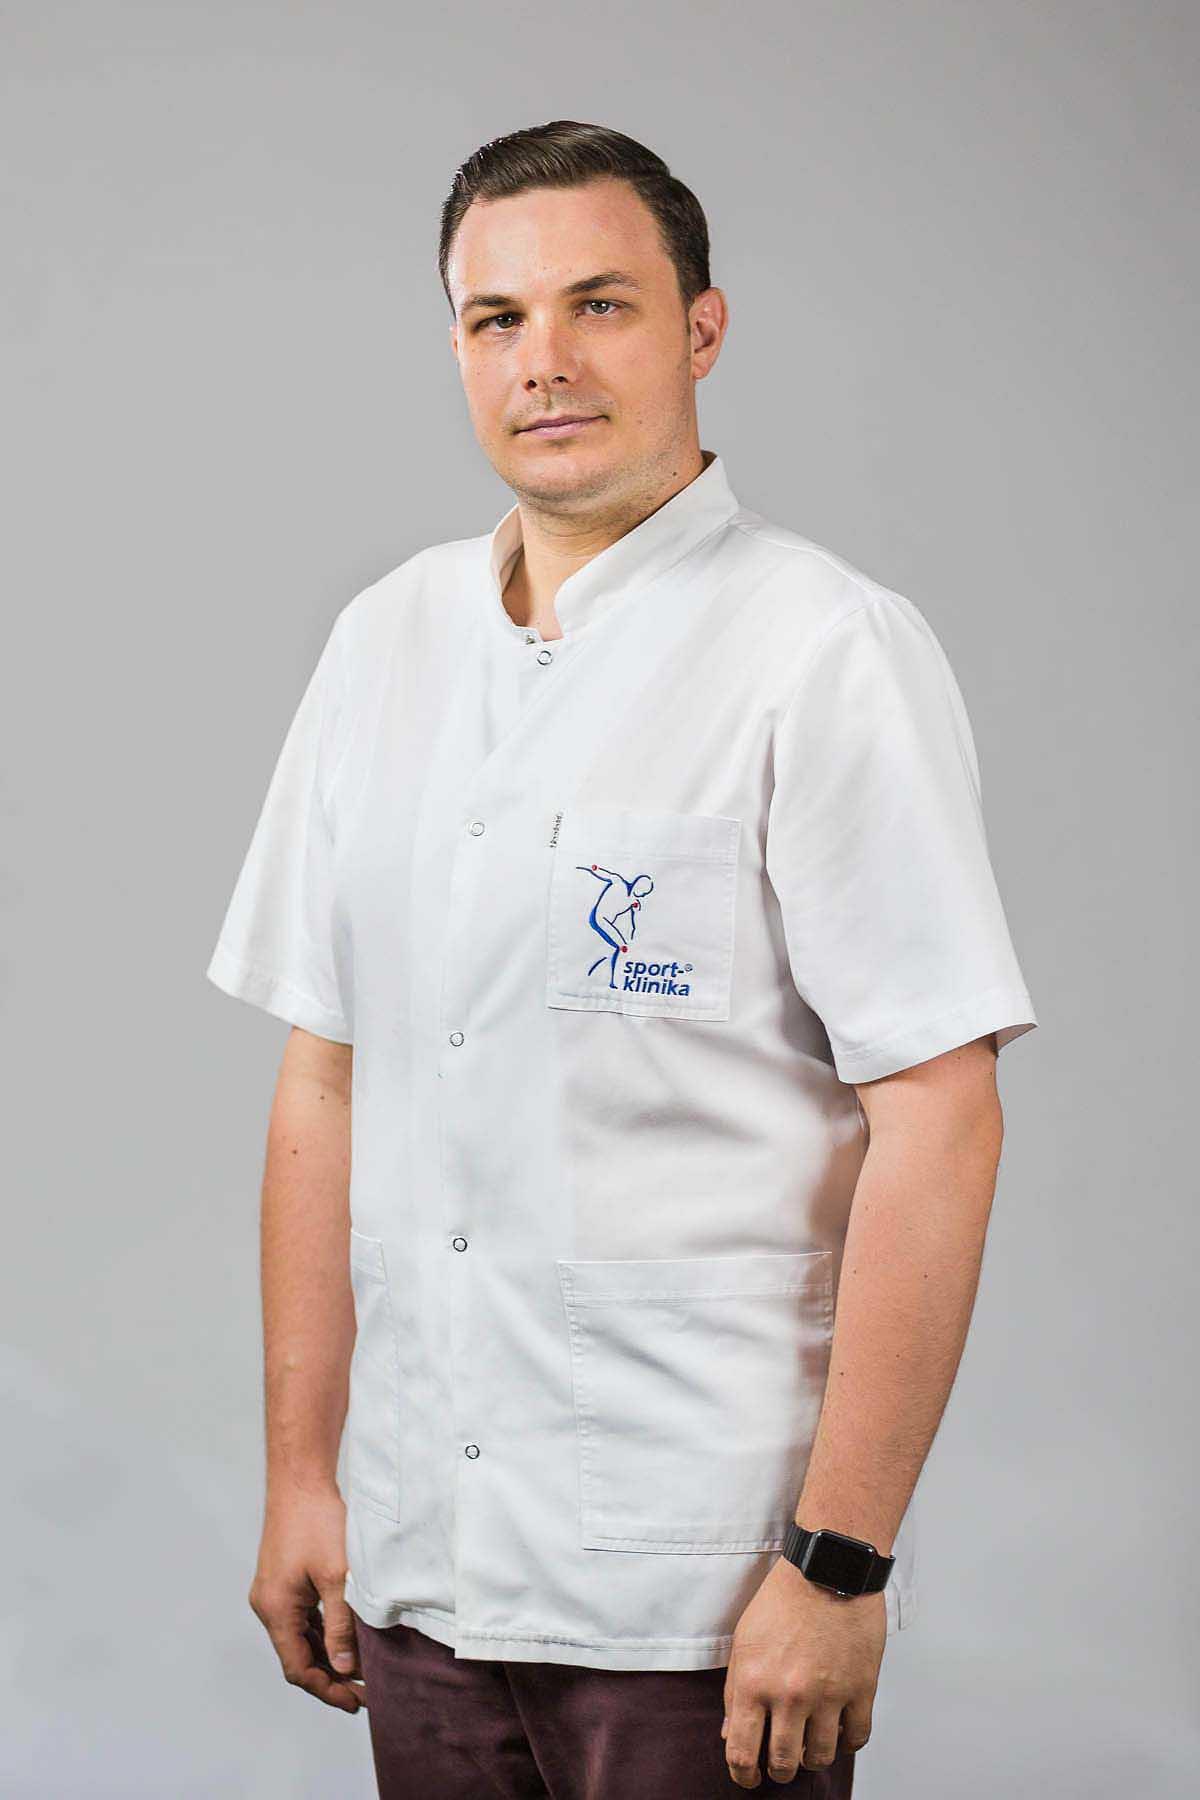 lek. med. Paweł Chodakowski